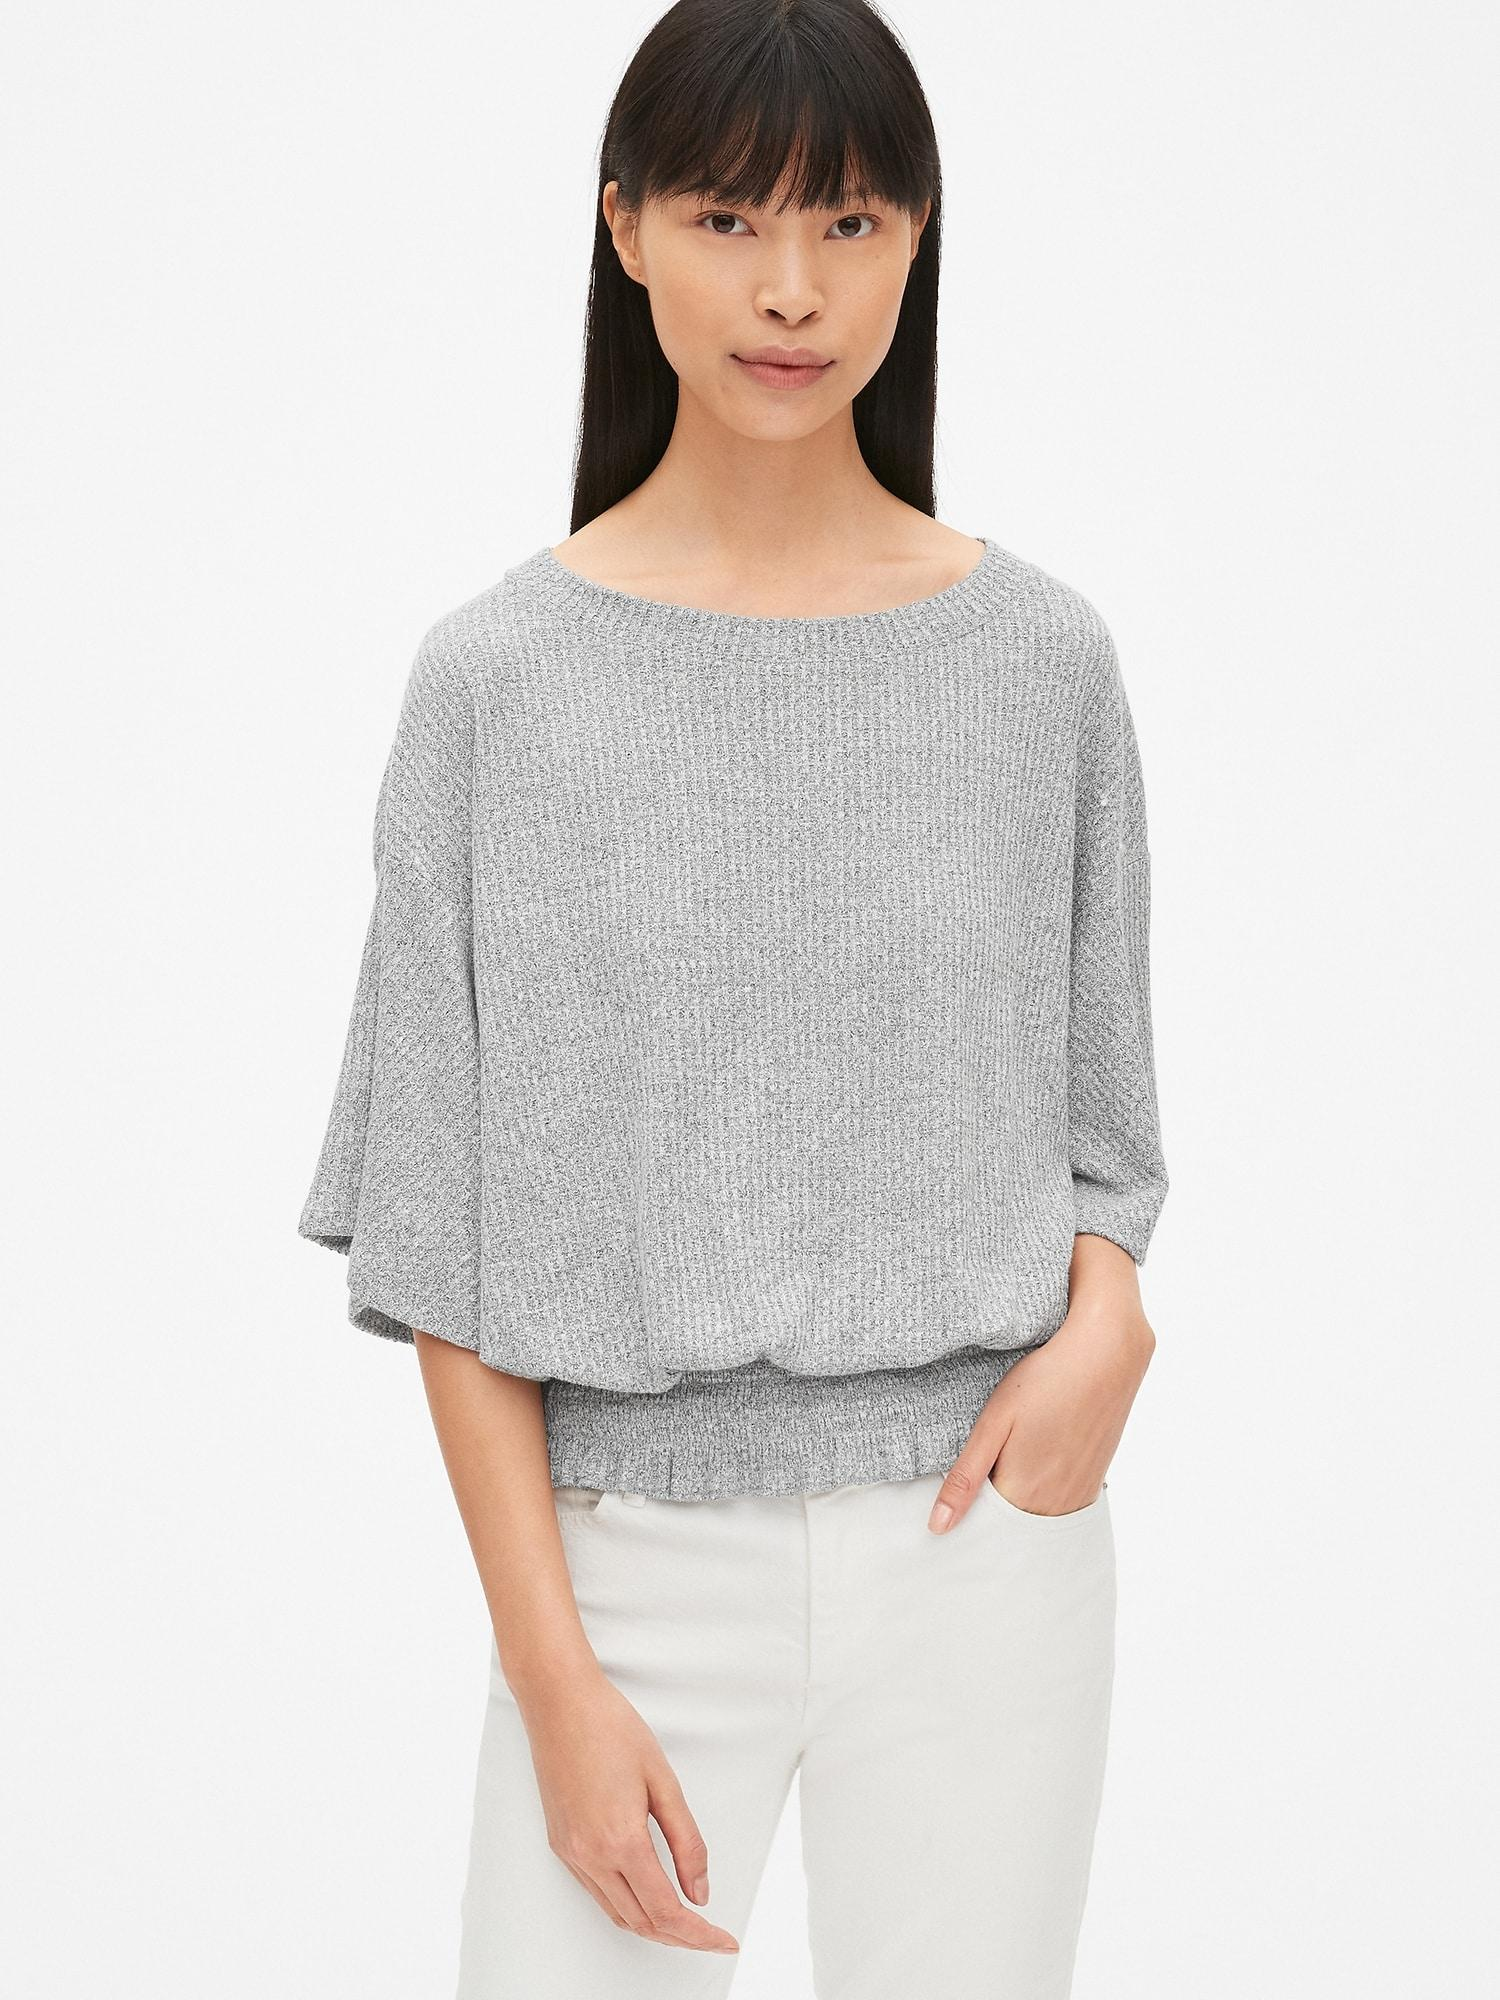 7e3ba078c7848 Lyst - Gap Softspun Waffle-knit Smocked Short Sleeve Top in Gray